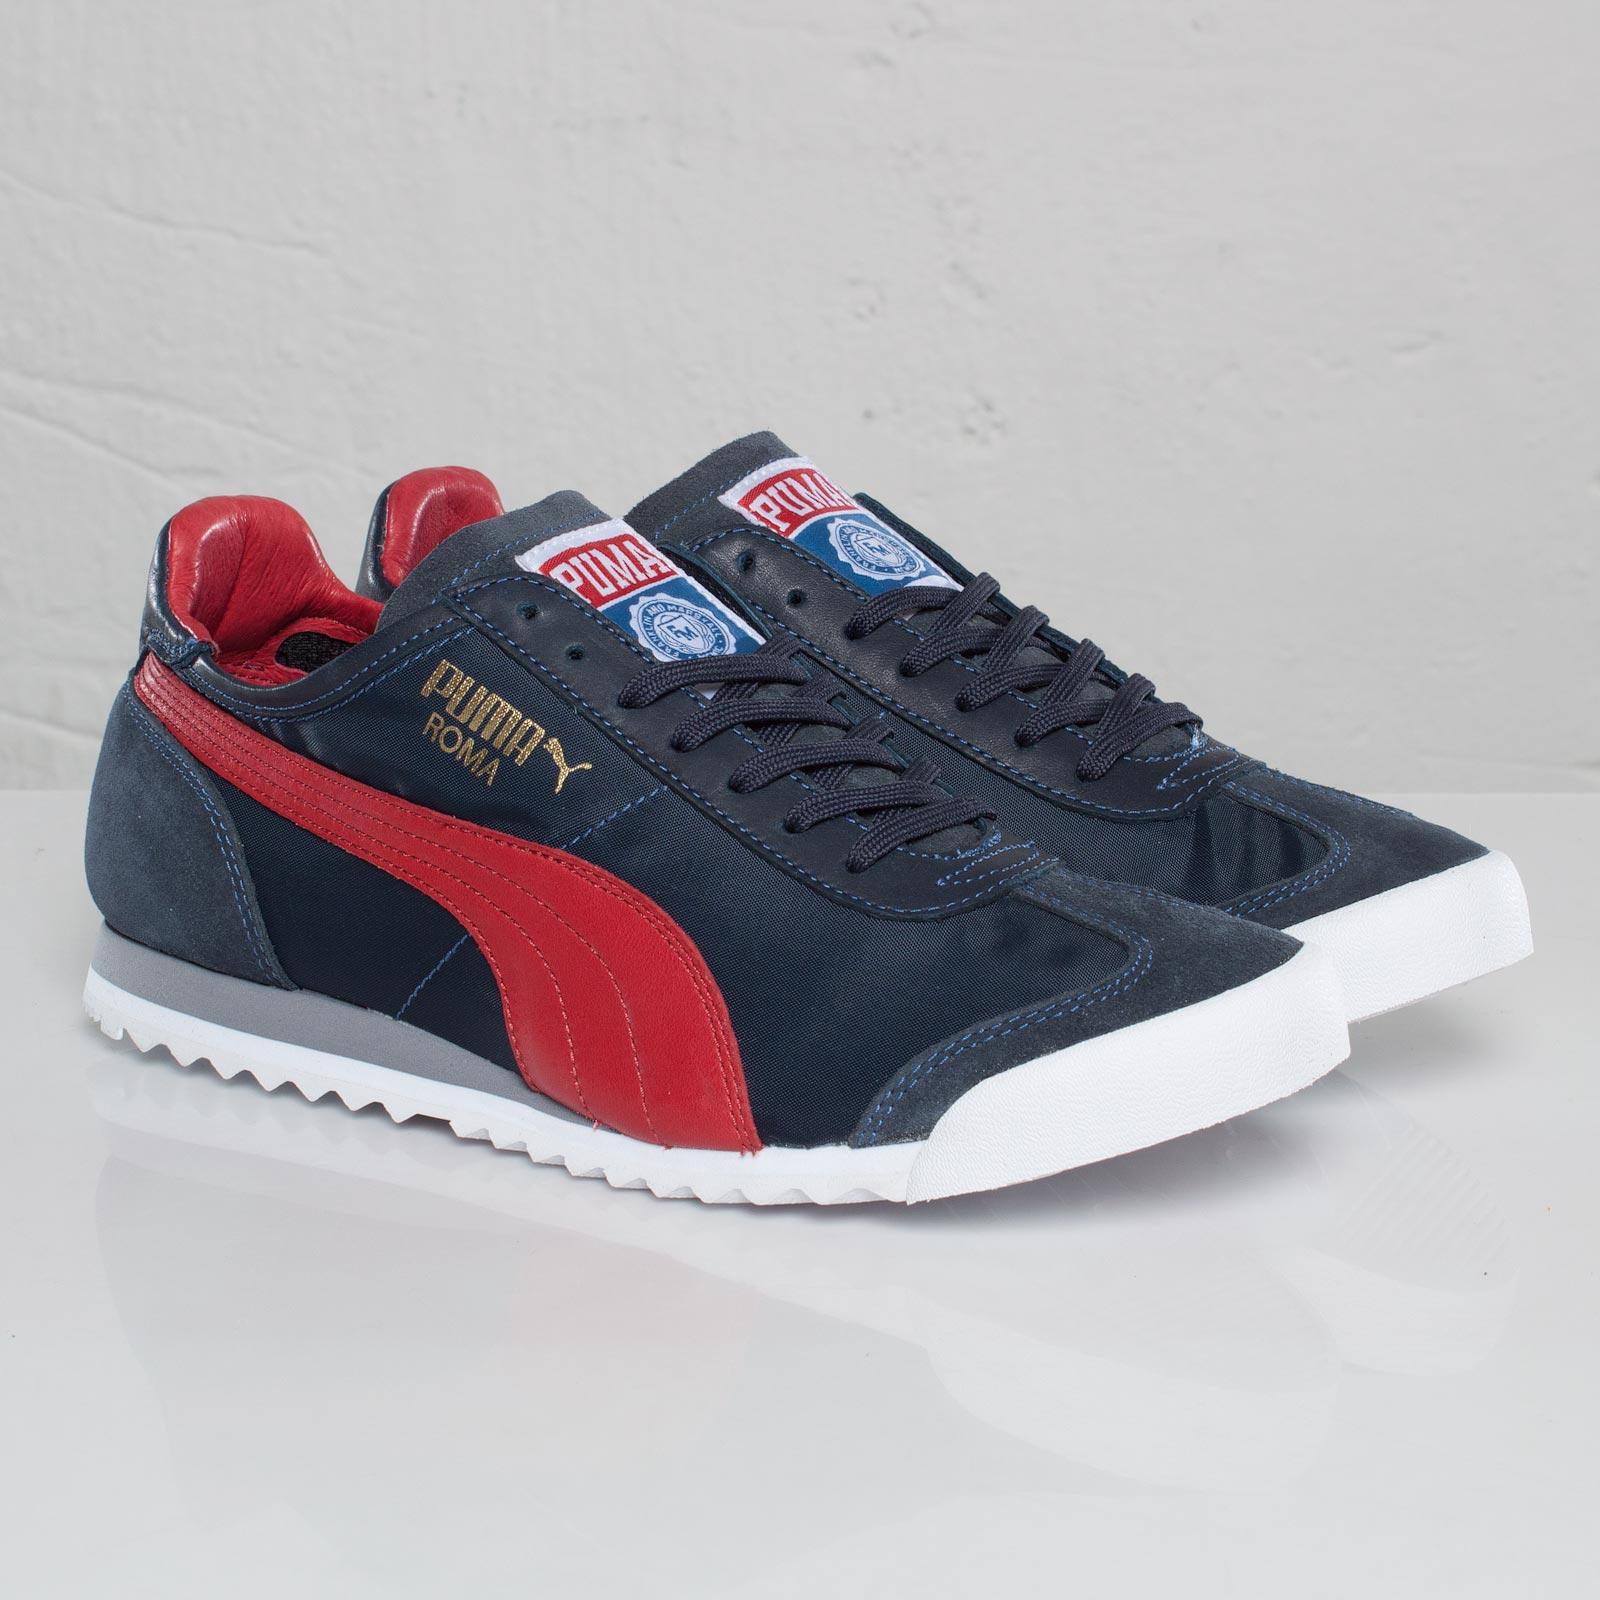 Puma Roma Luxe Nylon F M - 109646 - Sneakersnstuff  cadd5b733227